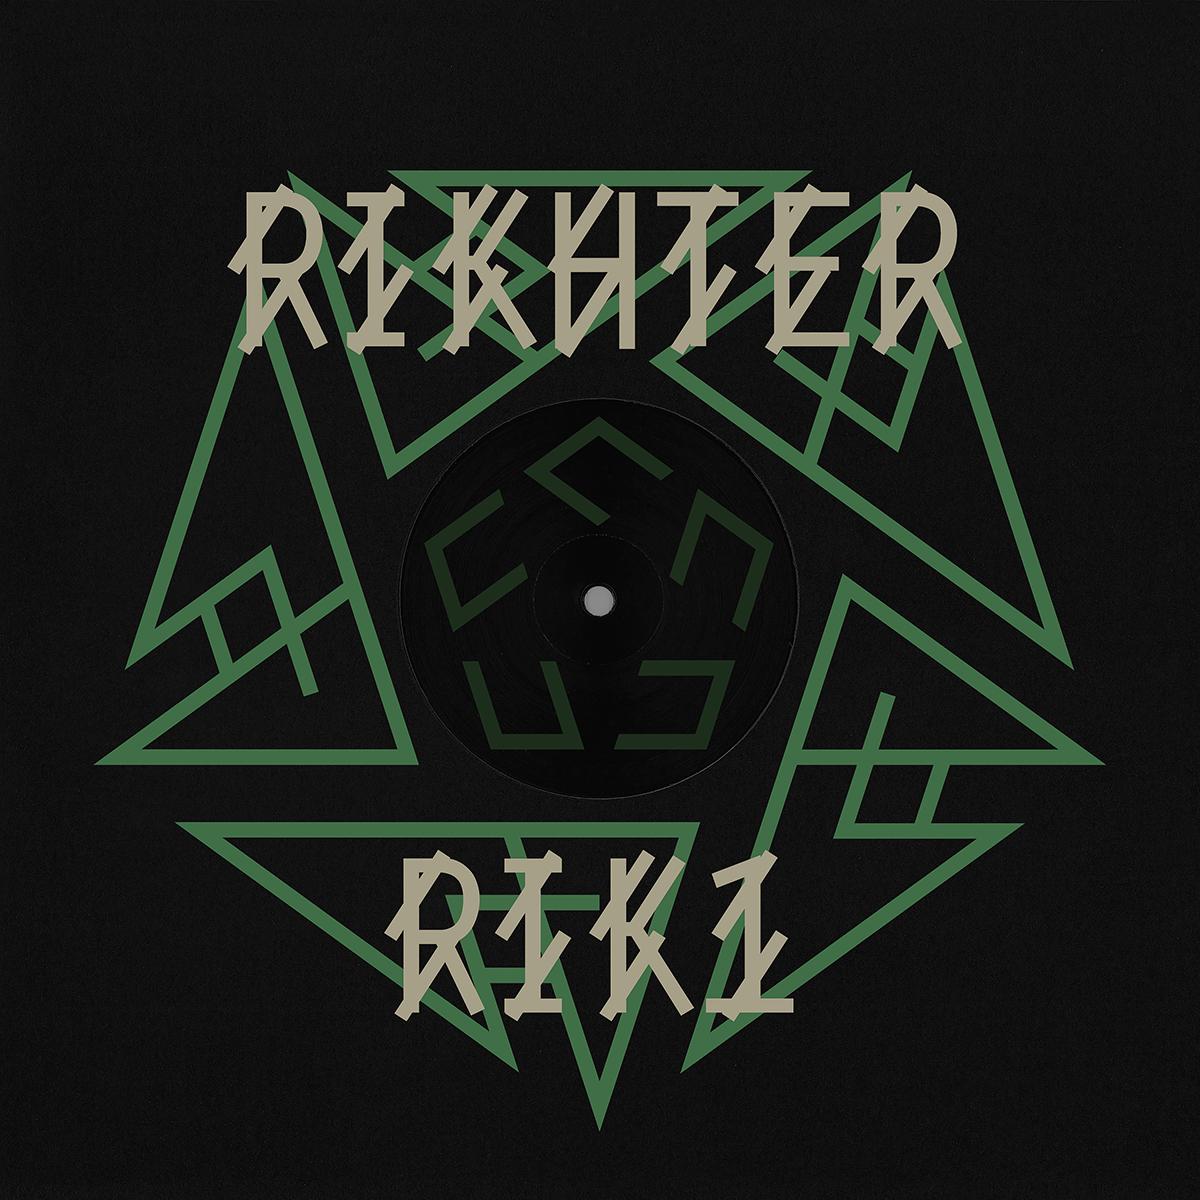 RIK1_front_1200px.jpg